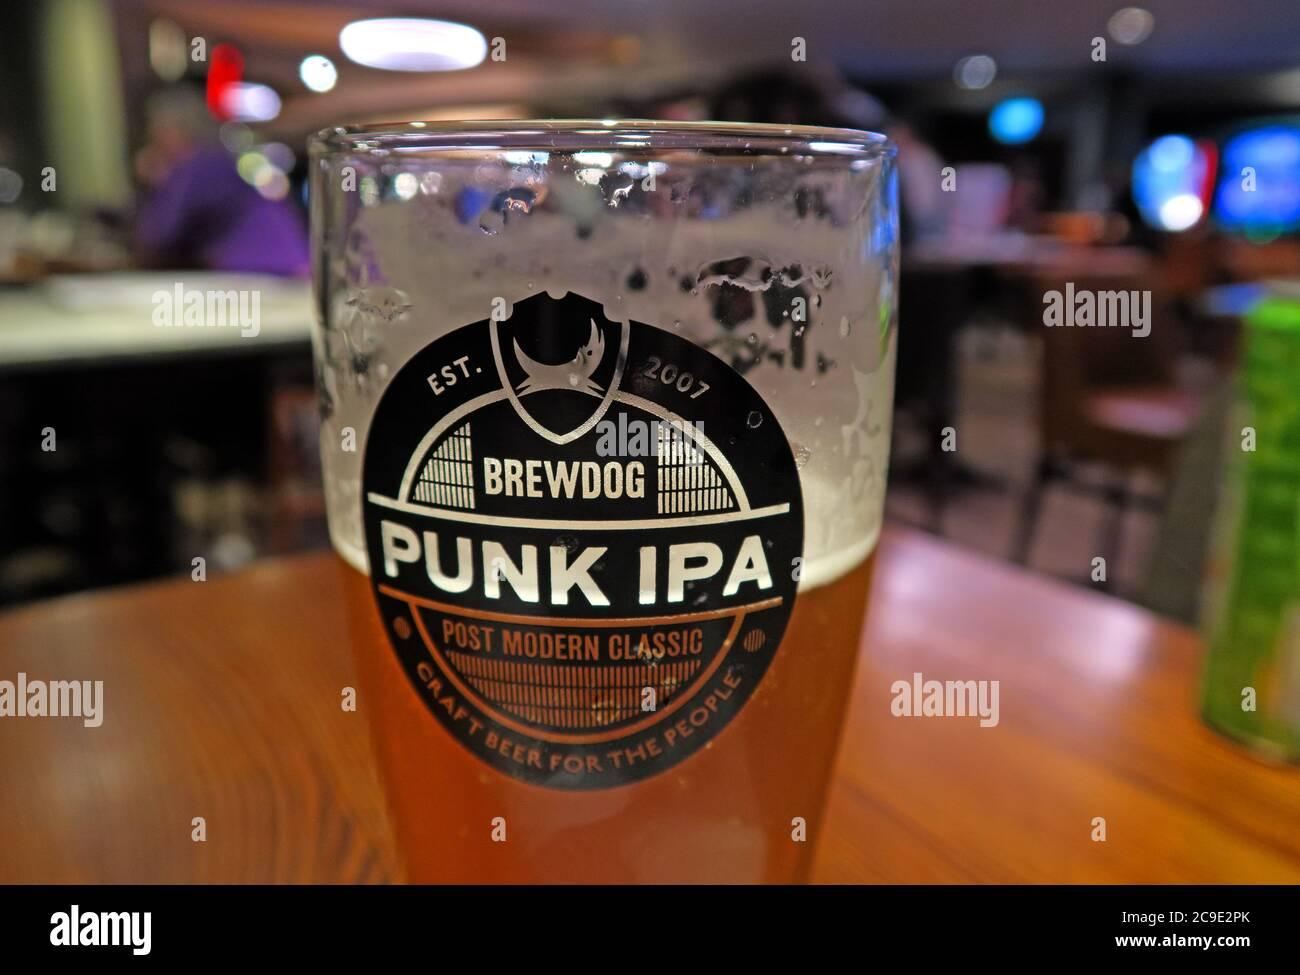 Brewdog Glass , Punk IPA glass, Wetherspoon Pub,cheap ale,cheap pint,Brewdog Brewing - glass half full Stock Photo